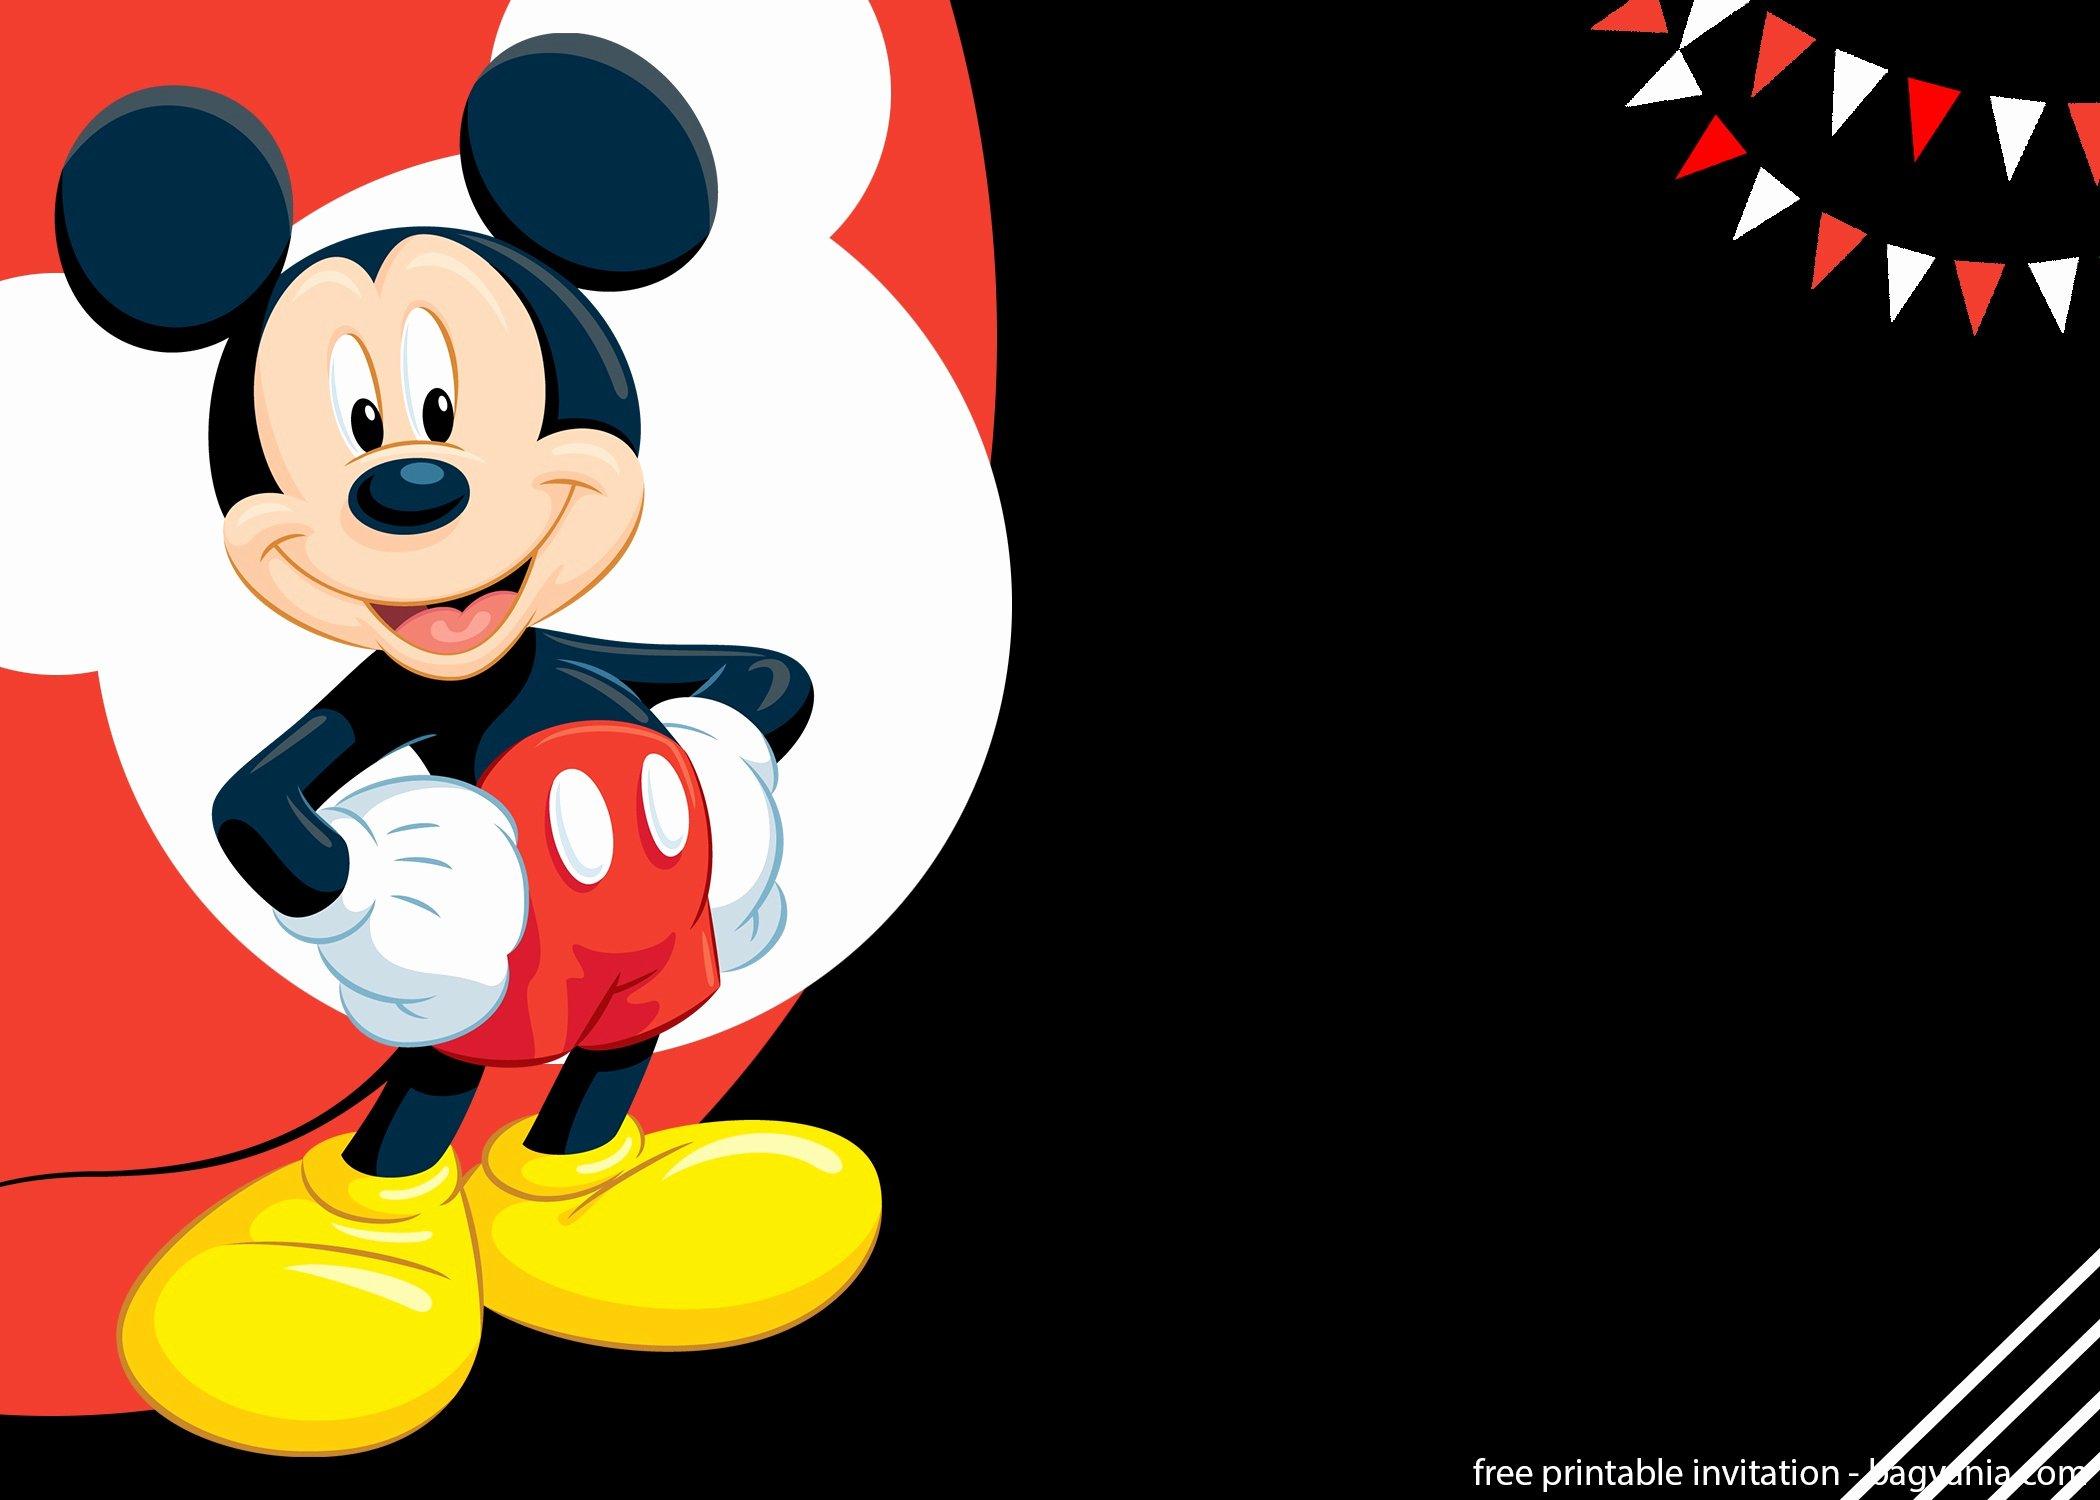 Mickey Mouse Invitations Templates Best Of Free Mickey Mouse Splish Splash Invitation Template – Free Printable Birthday Invitation